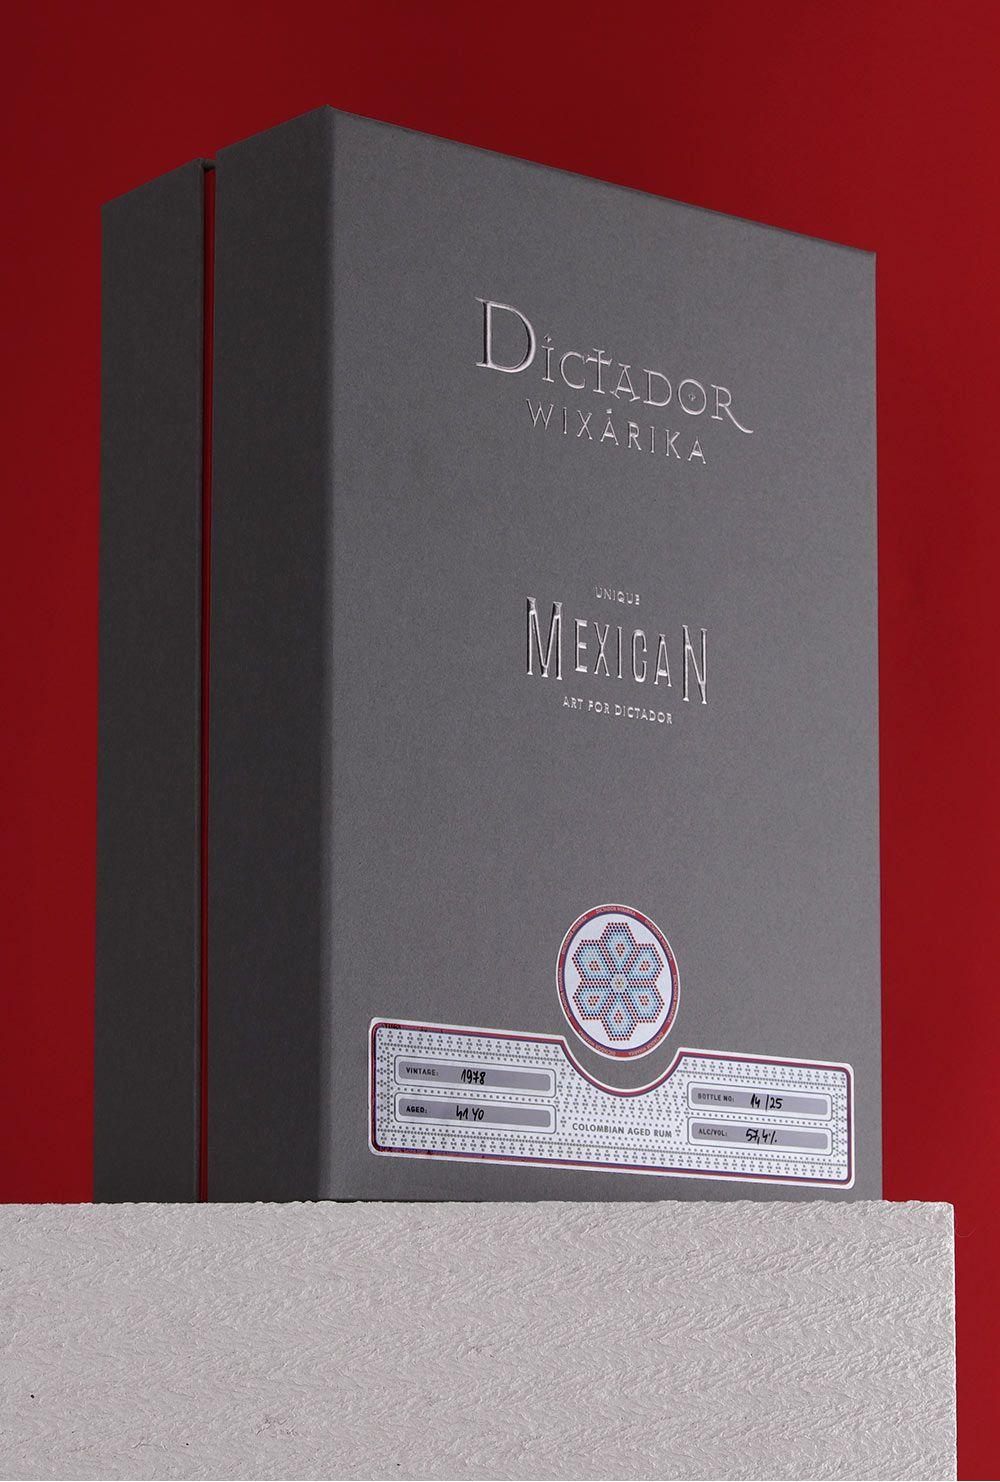 Dictador Wixarika - Model 2018/7